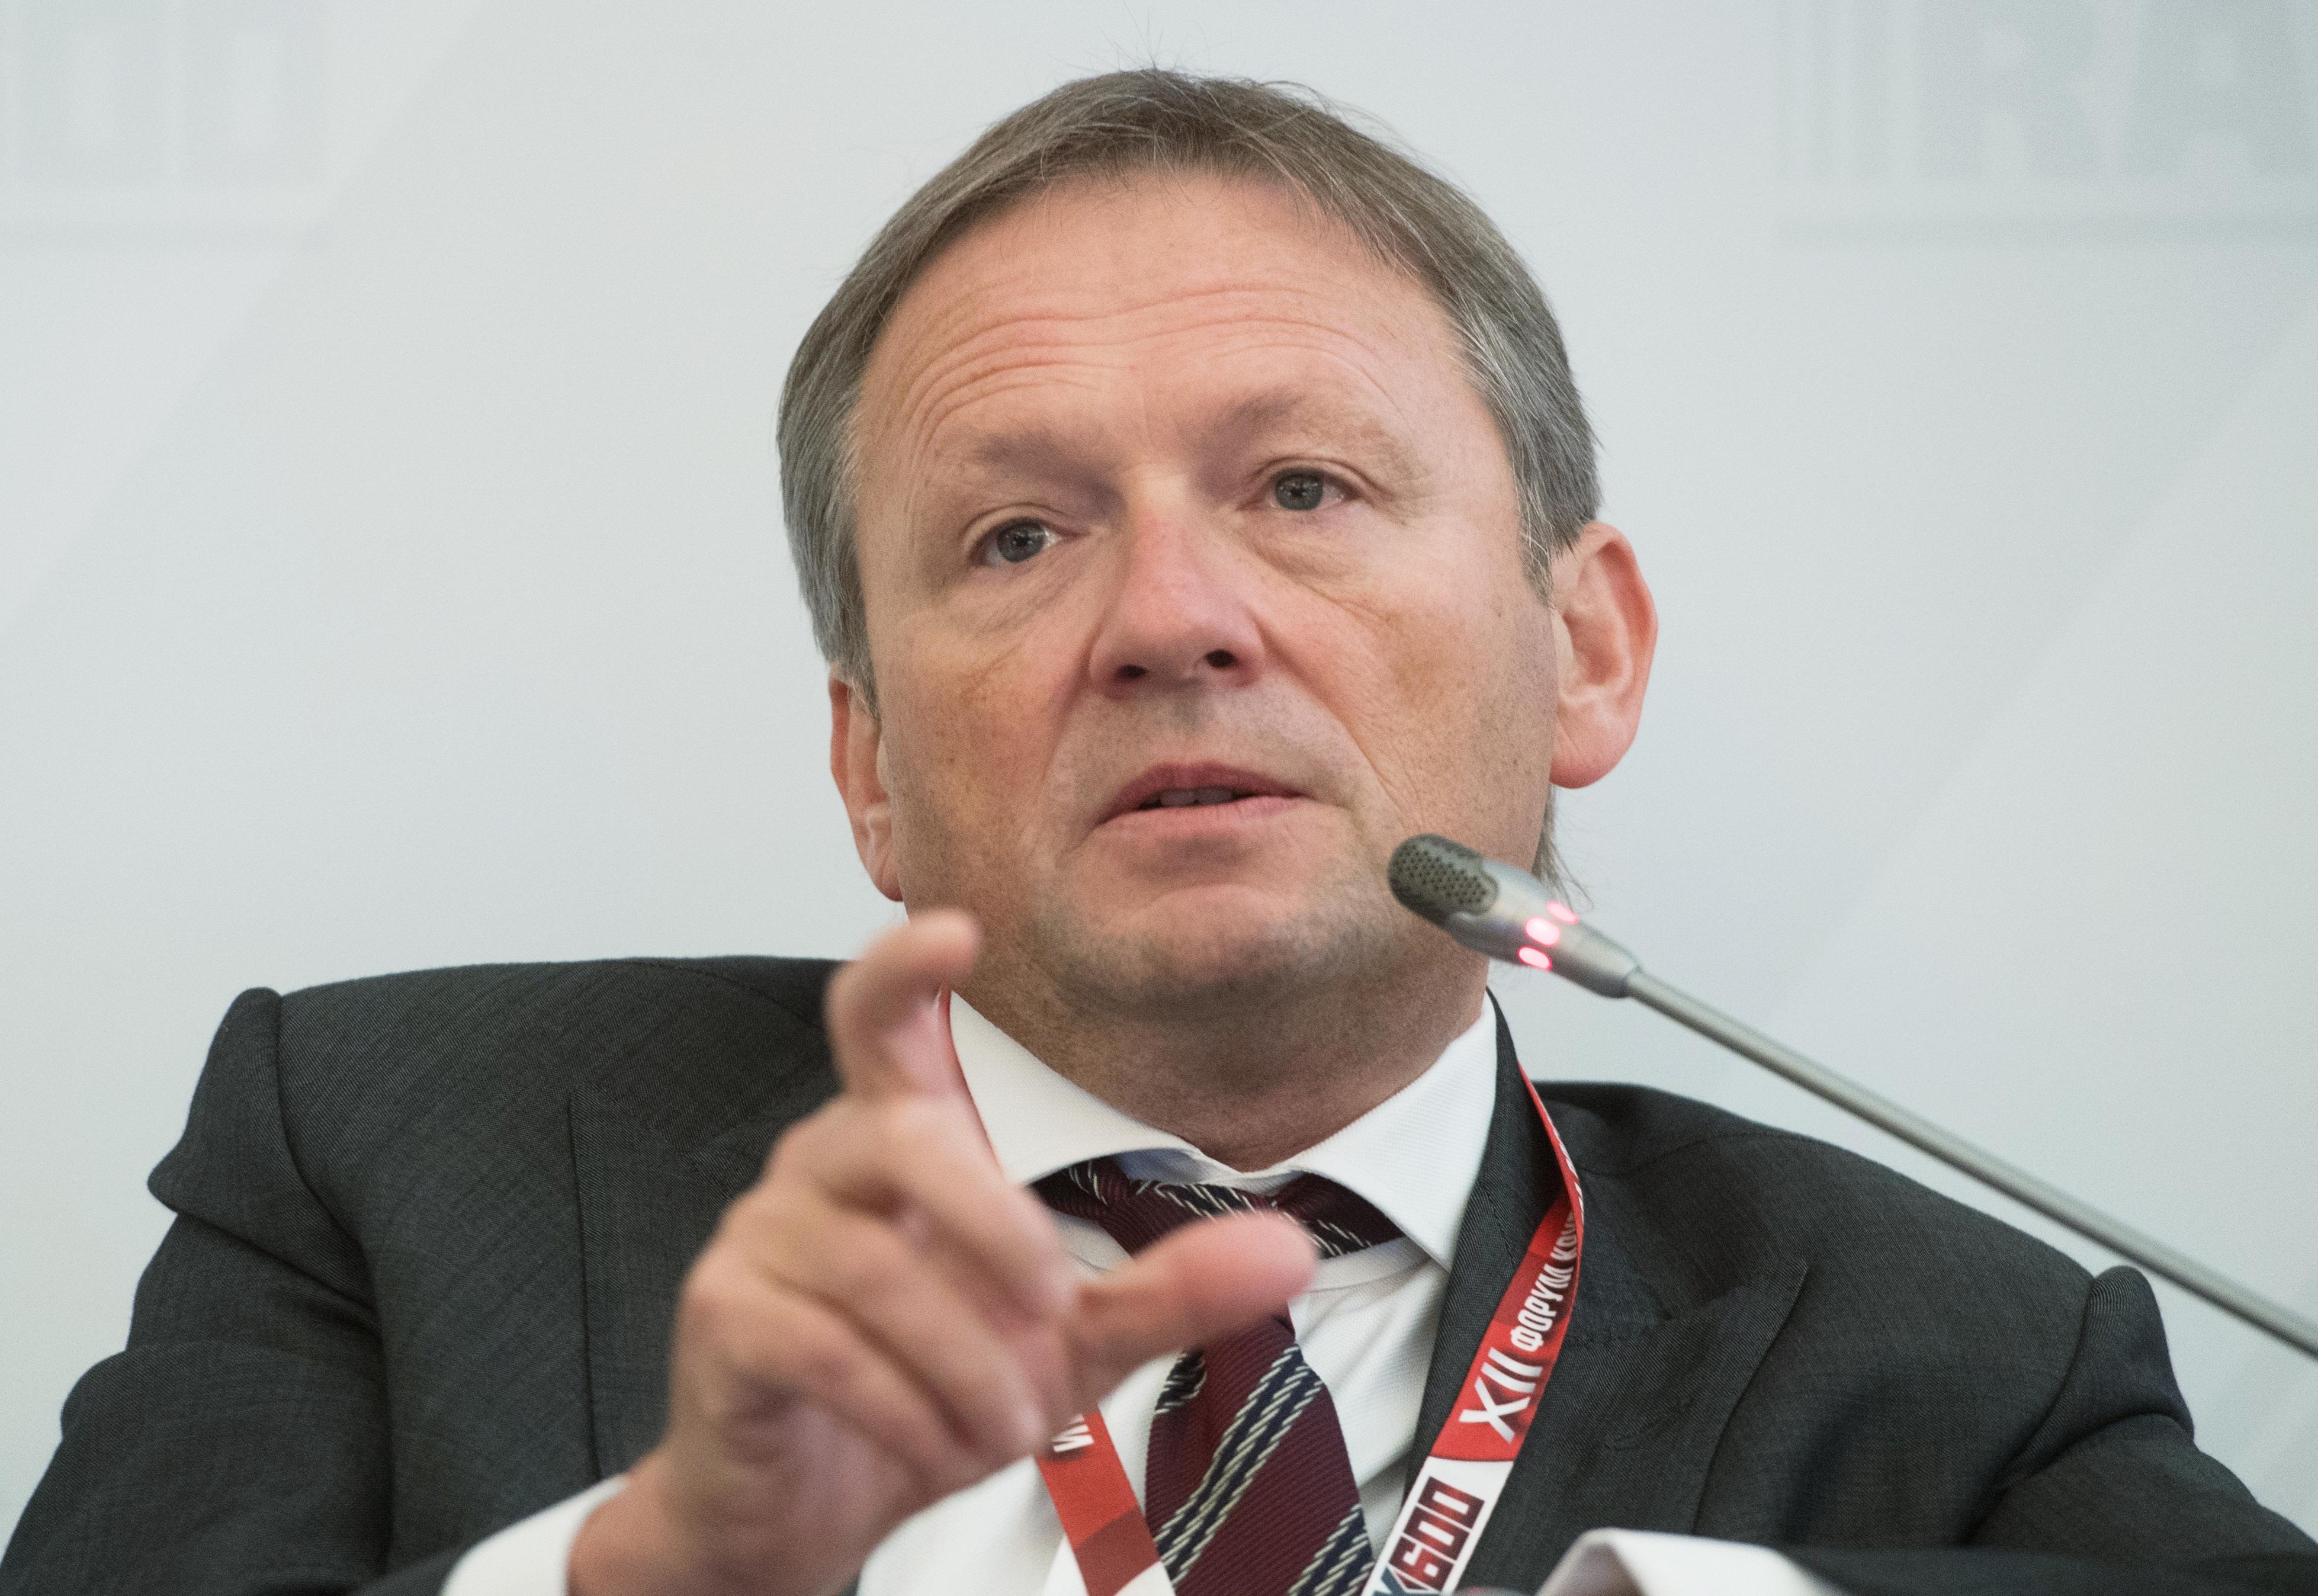 Кому майнить: Эксперты критикуют проект Бориса Титова